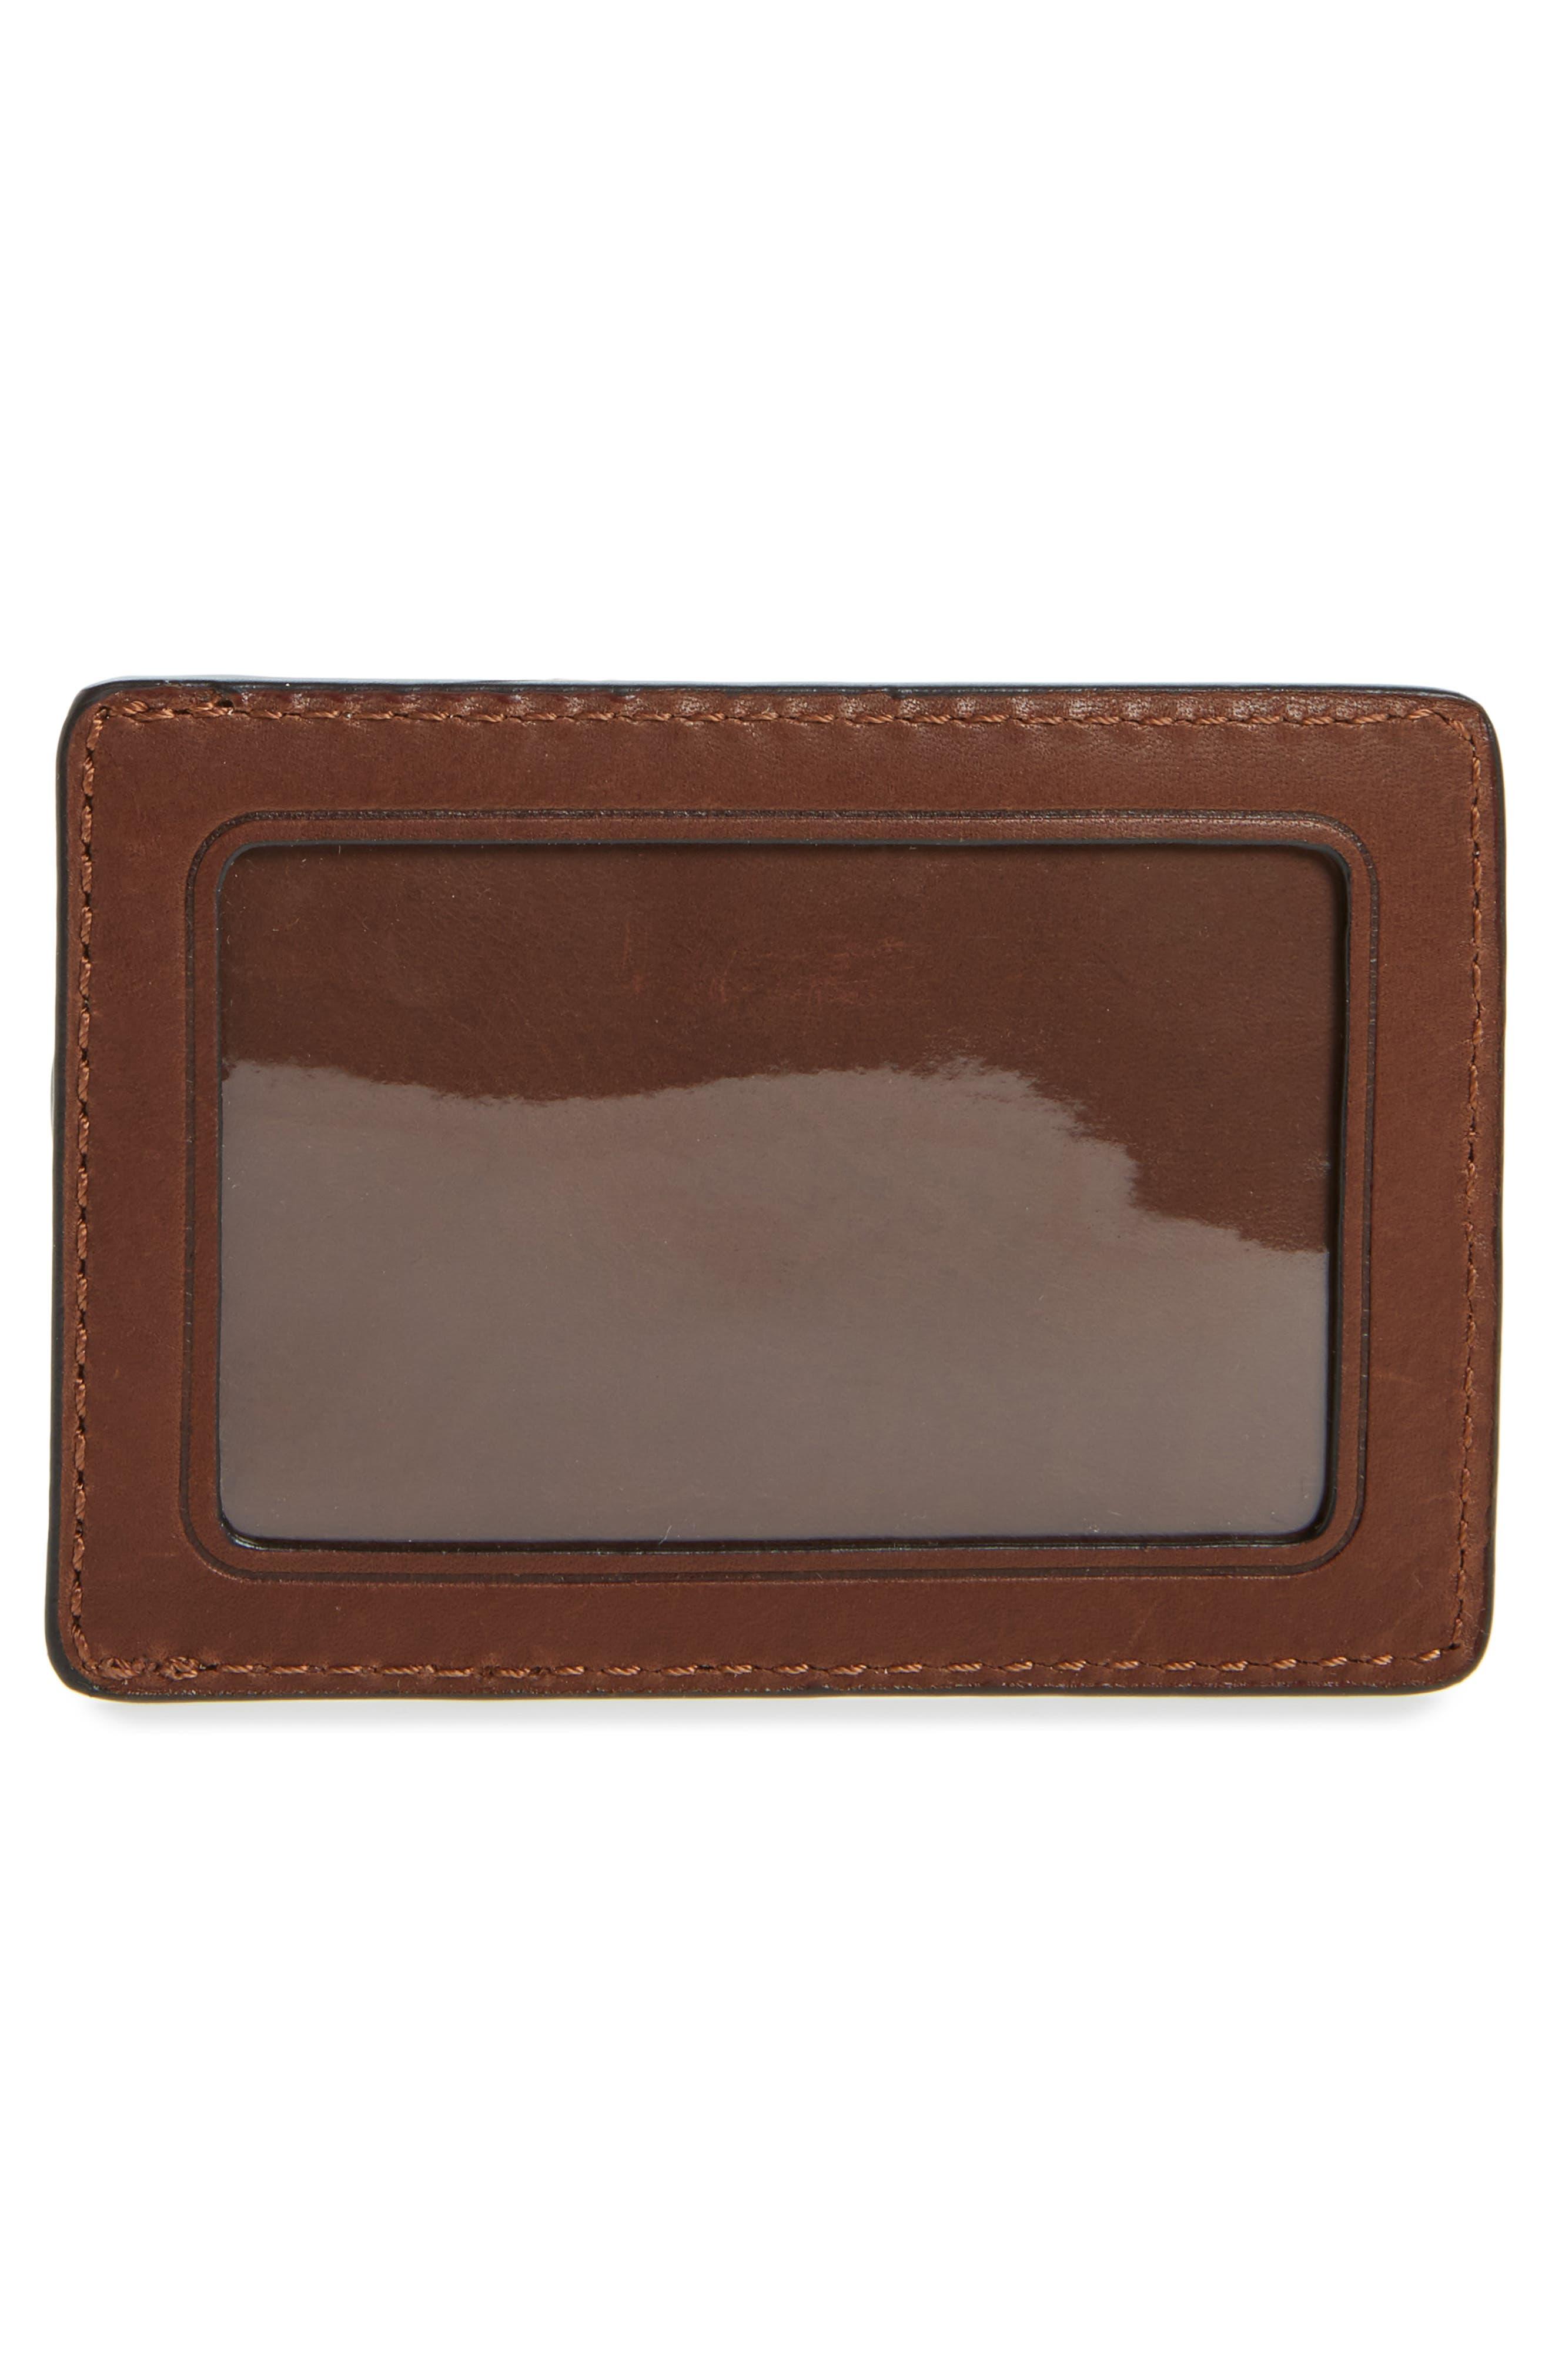 Oliver Leather Card Case,                             Alternate thumbnail 2, color,                             Cognac